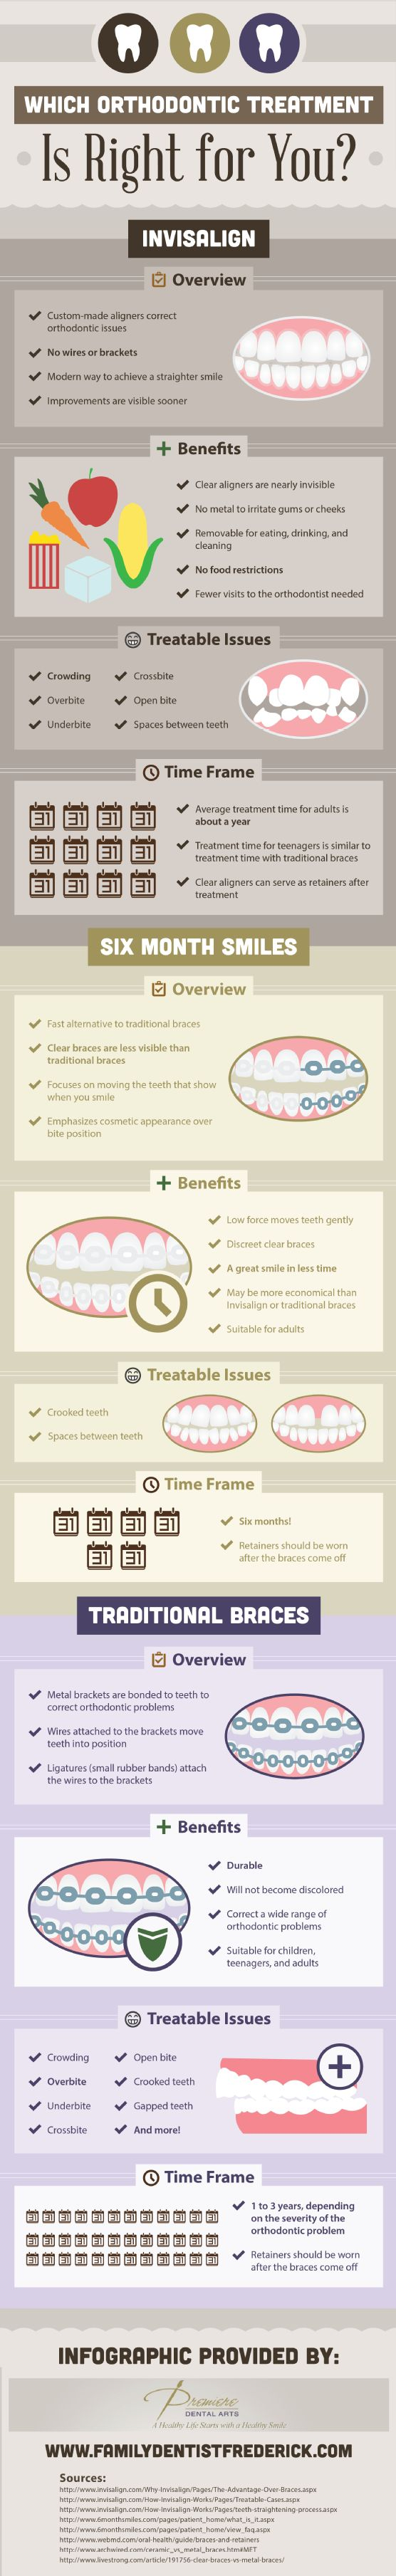 Invisalign, six month smiles, or traditional braces? #invisalign #smile #braces #dentist